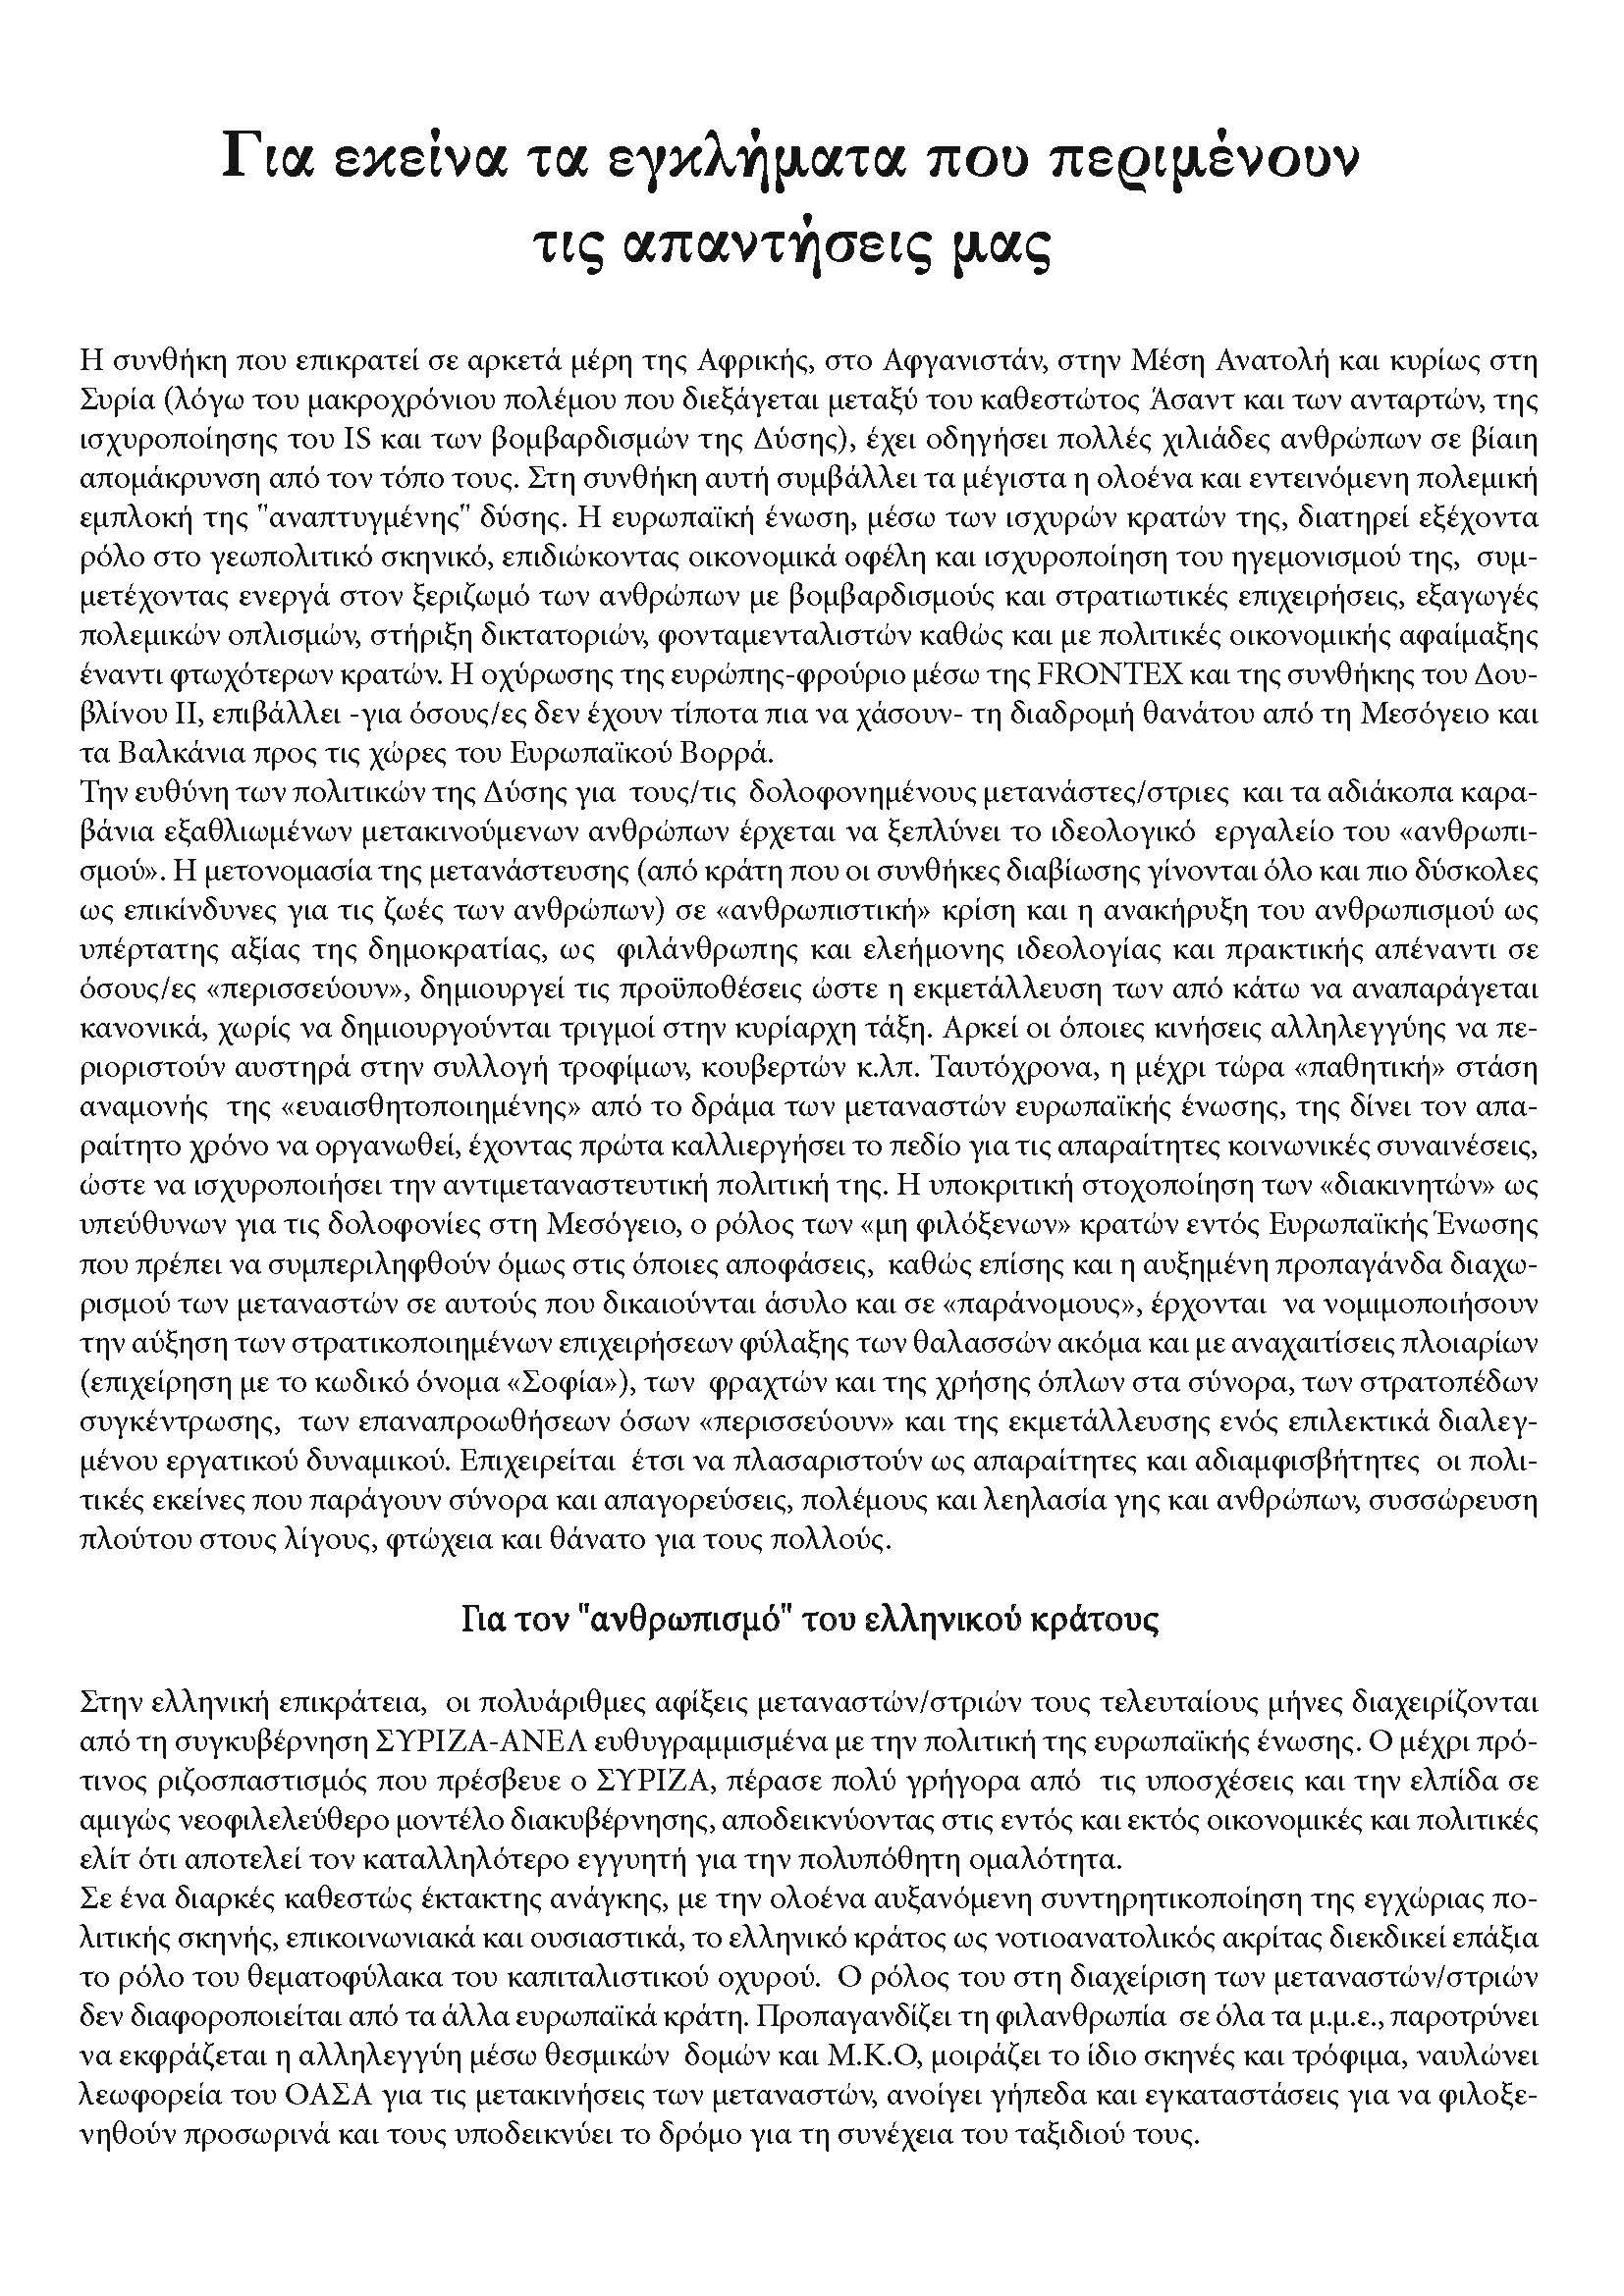 keimeno 14-11-15_Page_1